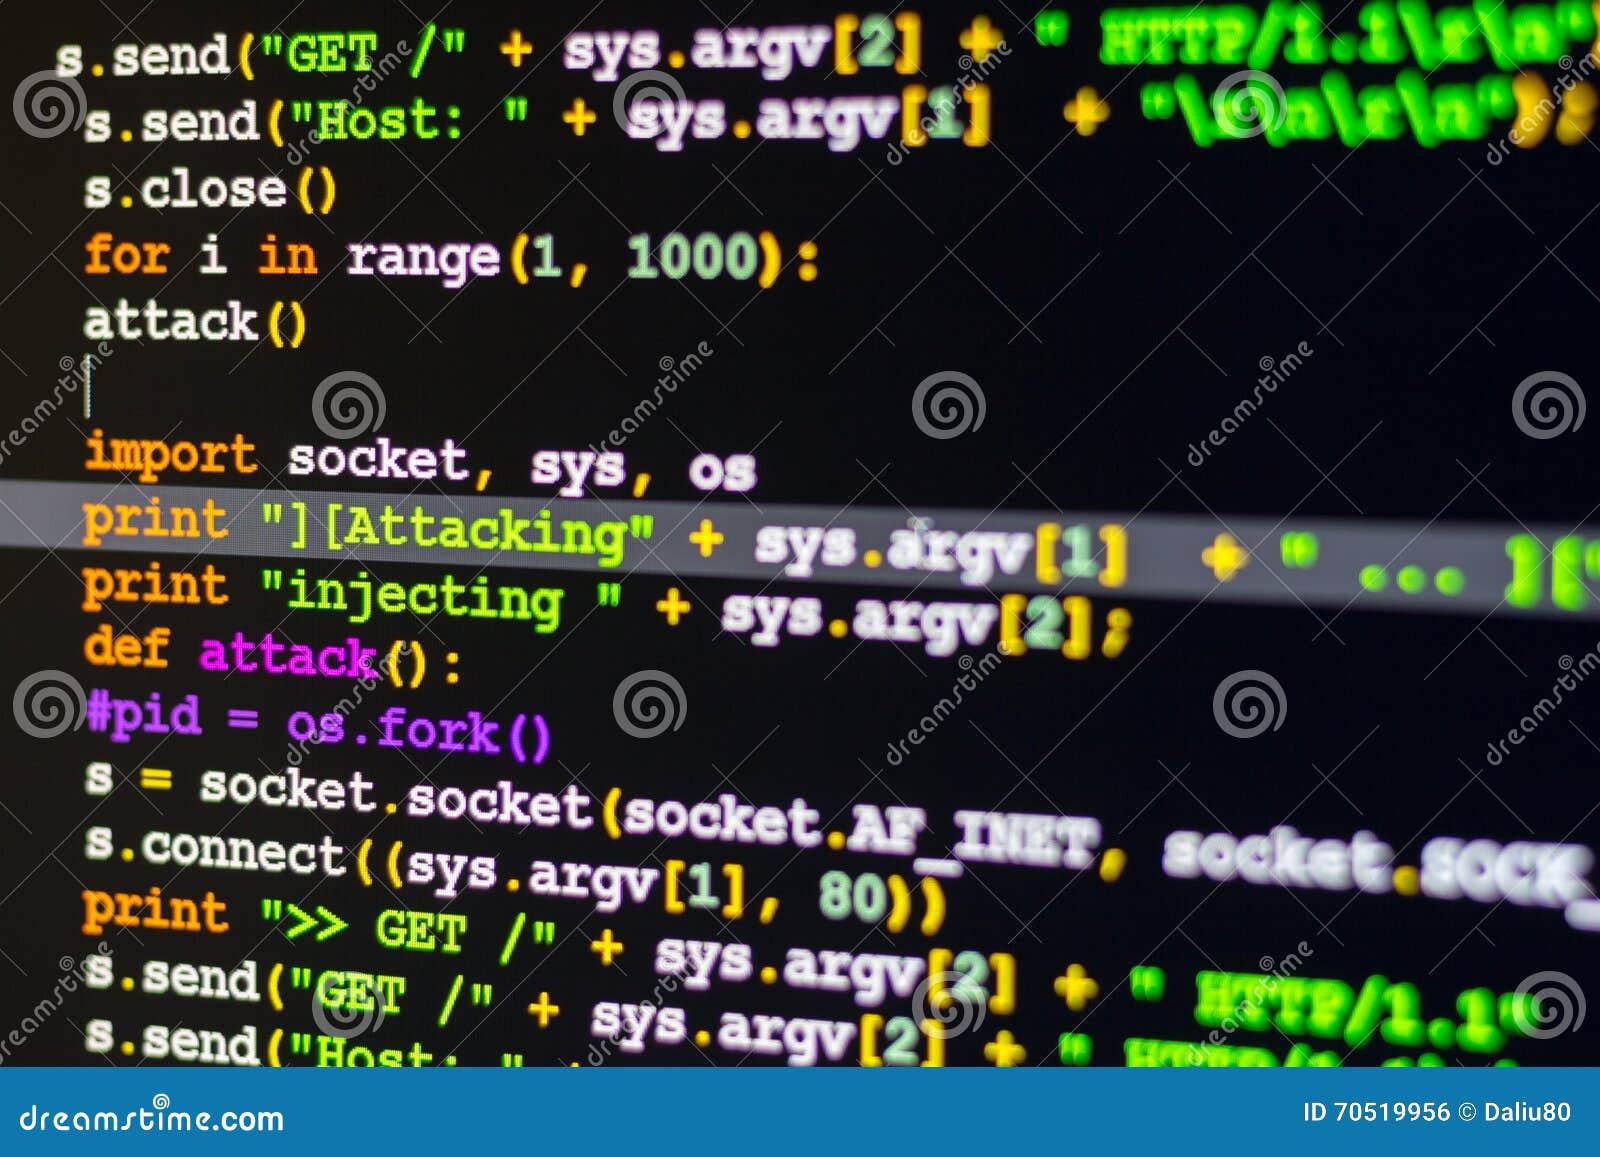 Ddos Attacker Online